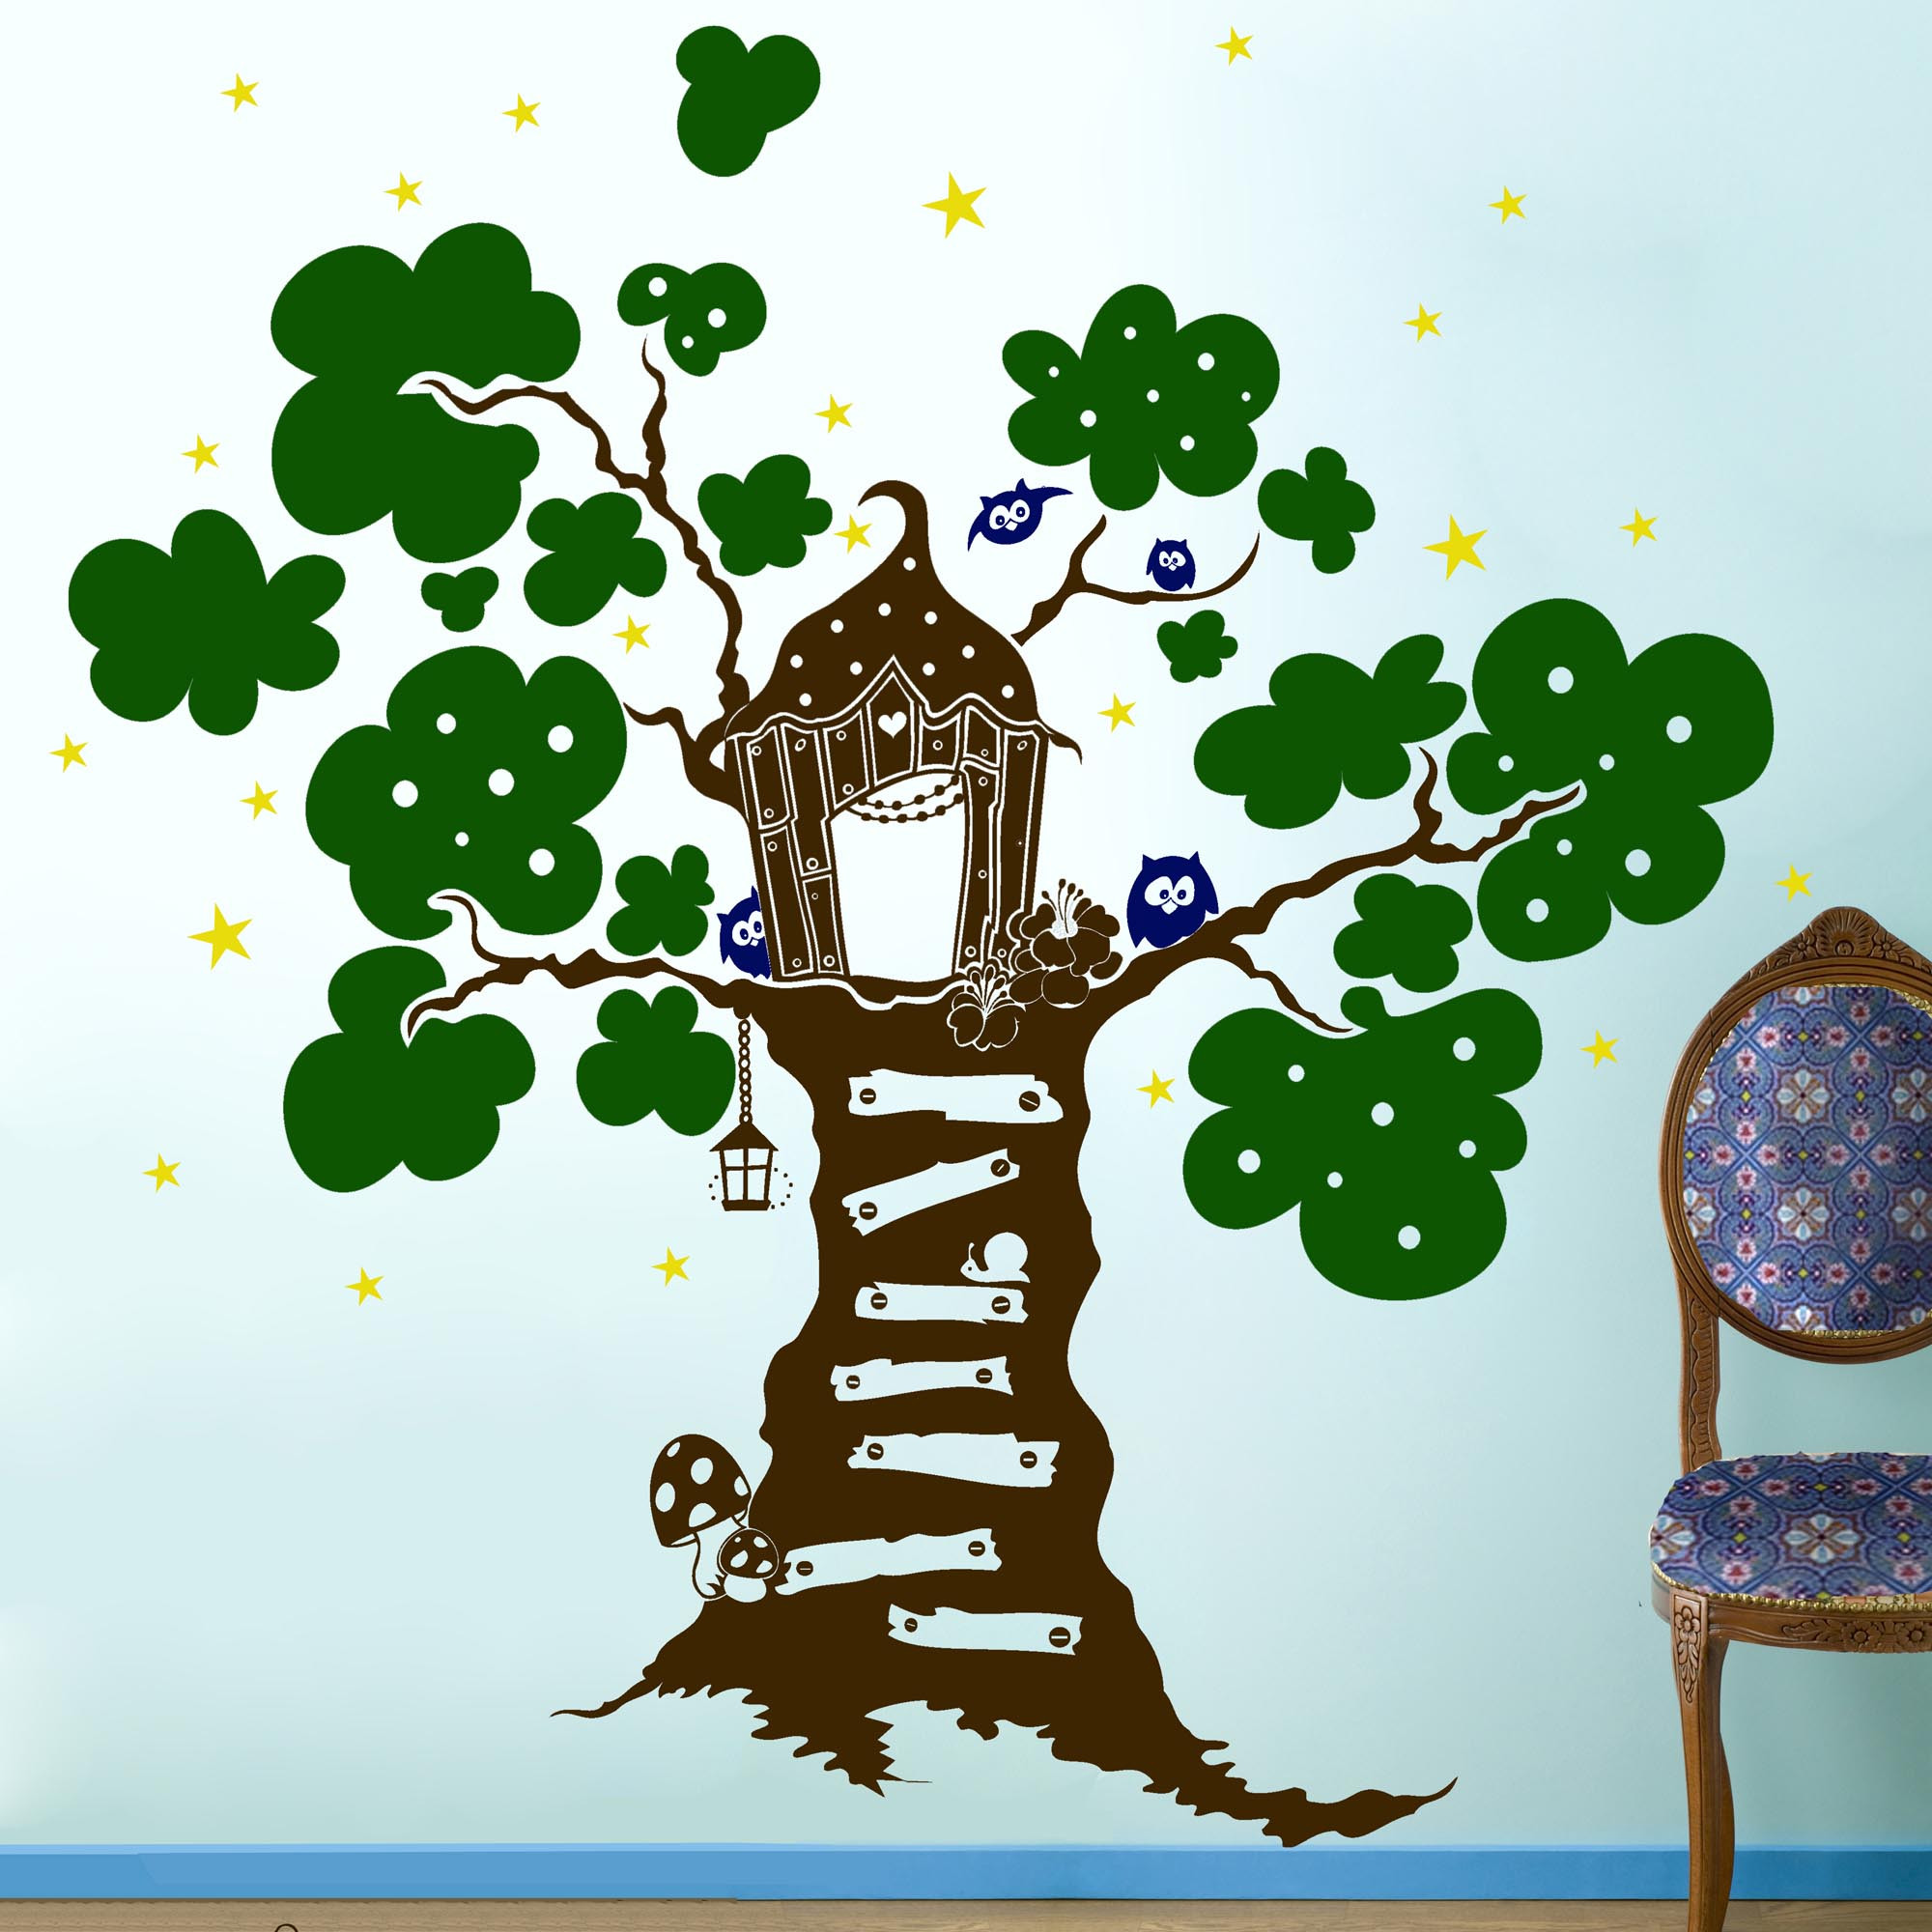 Wandtattoo wandaufkleber eulen eule baum sterne m670 - Wandtattoo eulenbaum ...